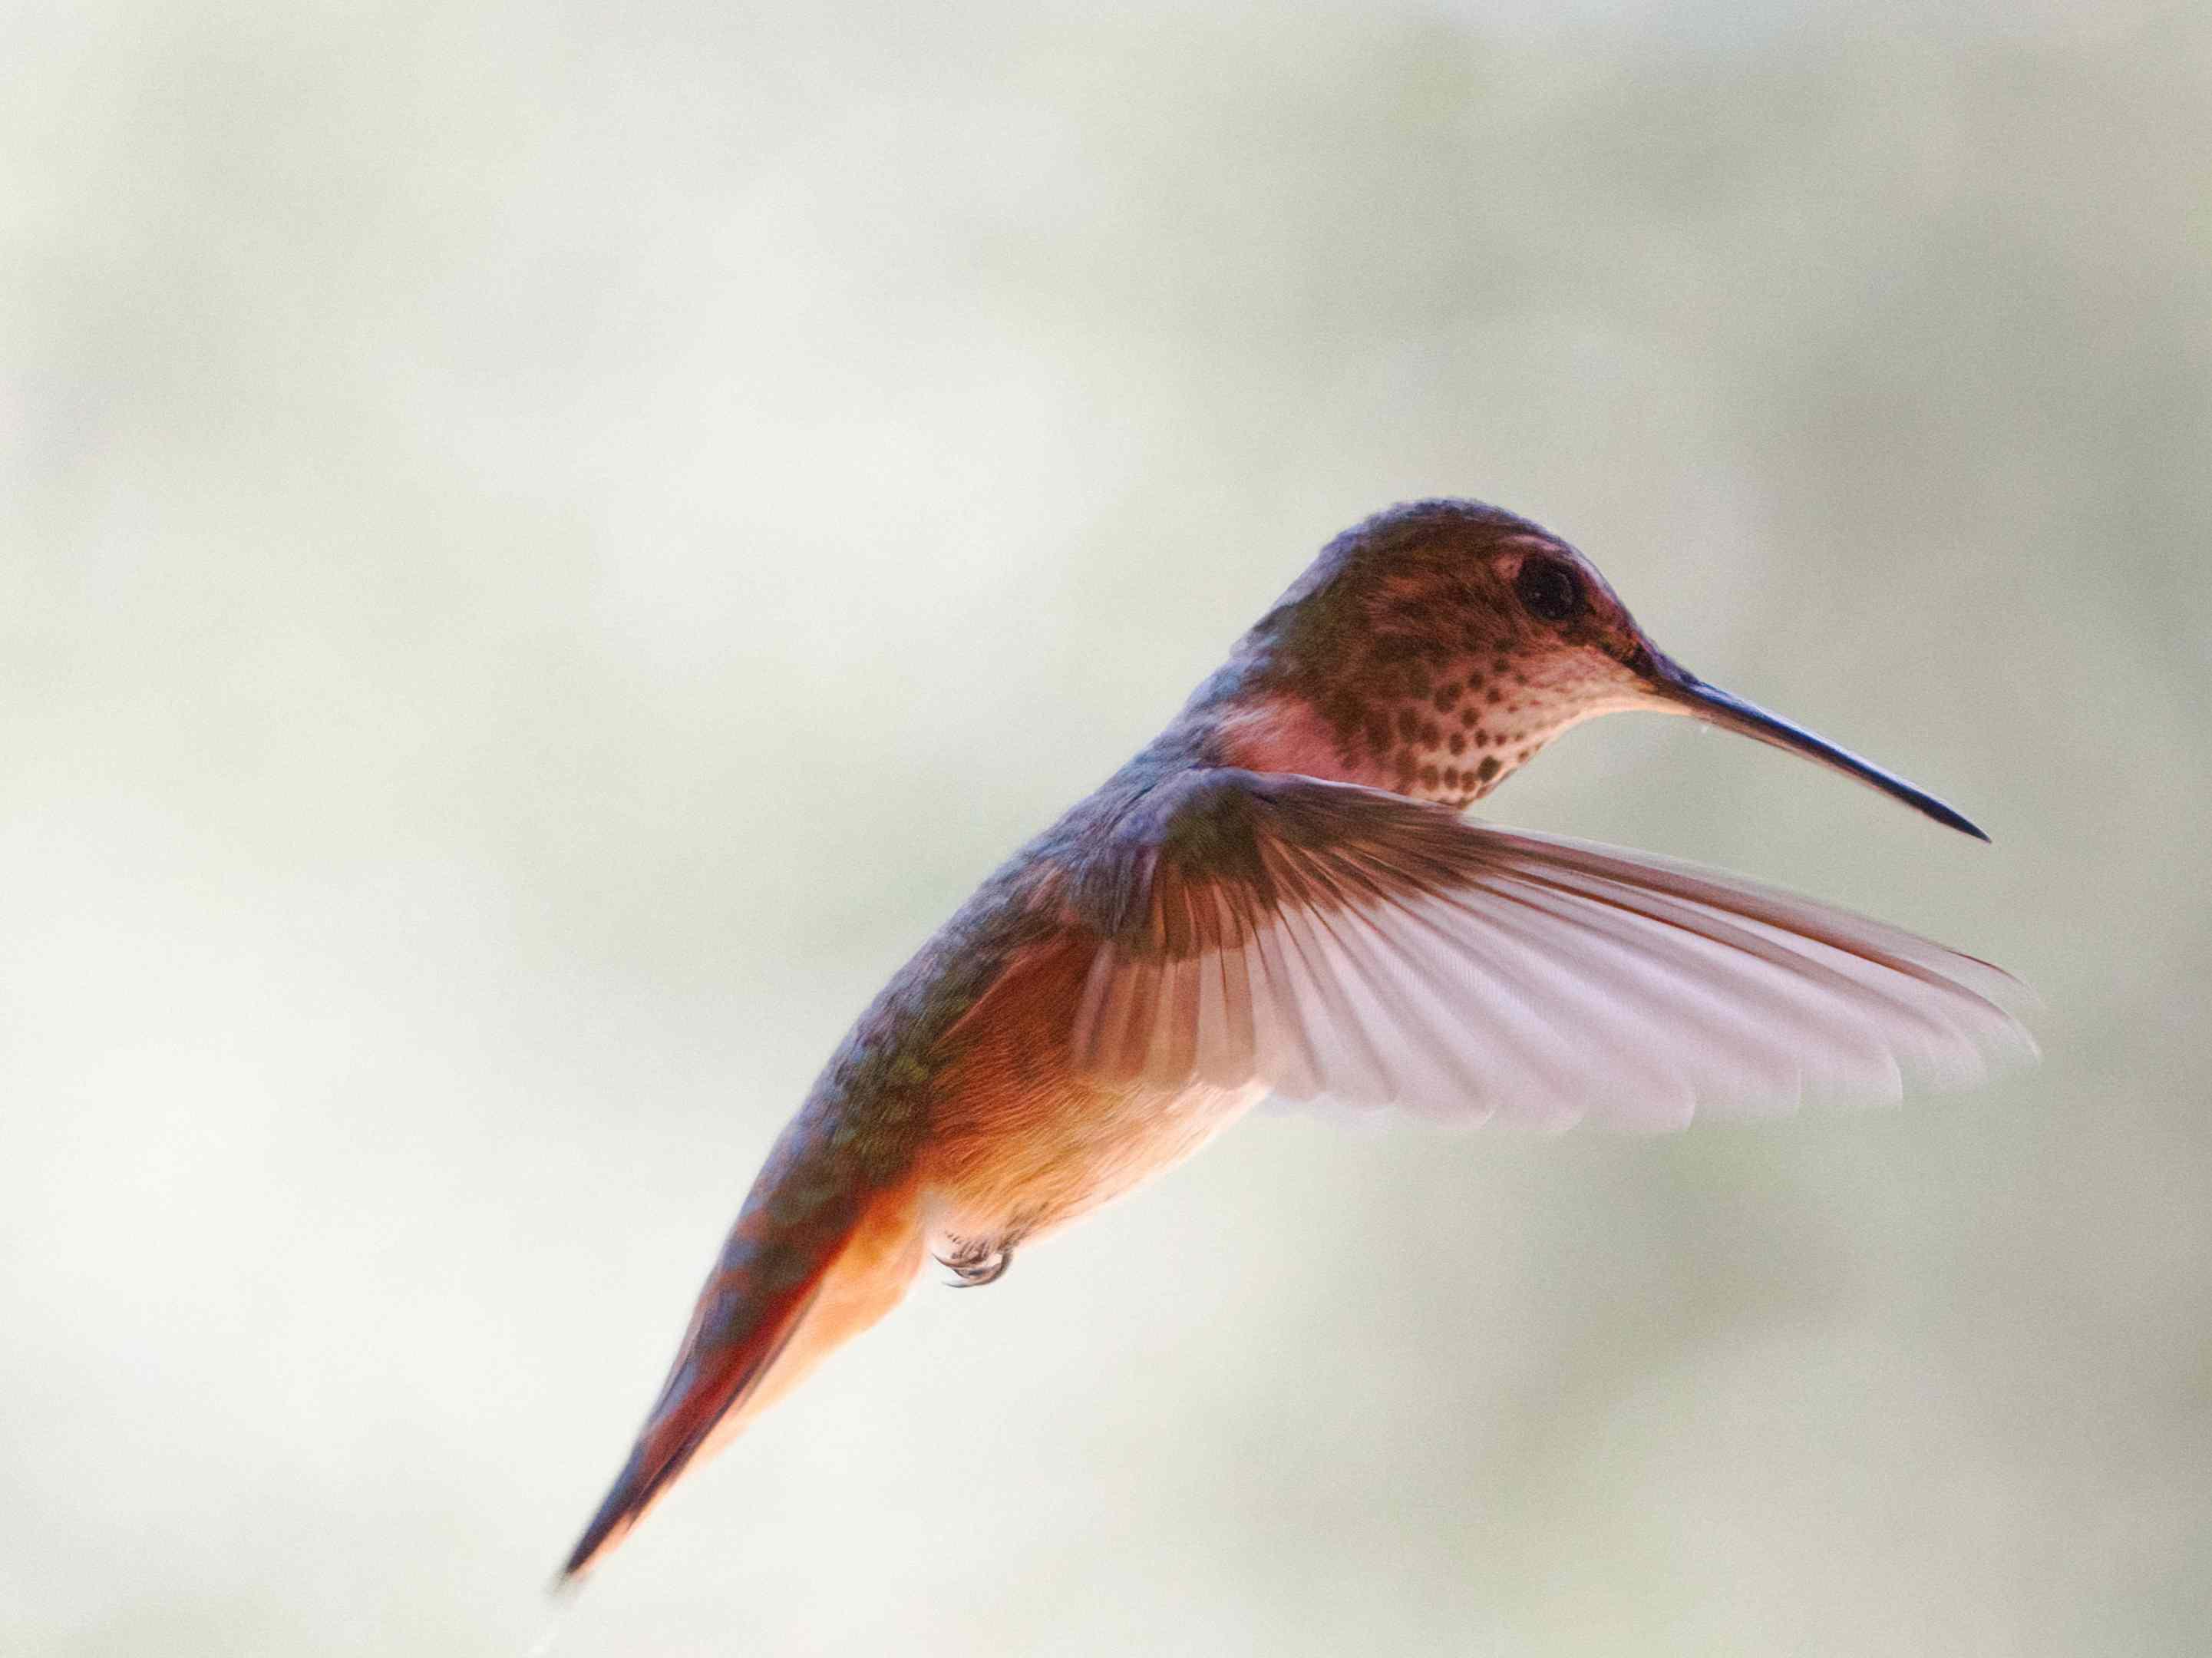 brown spotted hummingbird in midflight